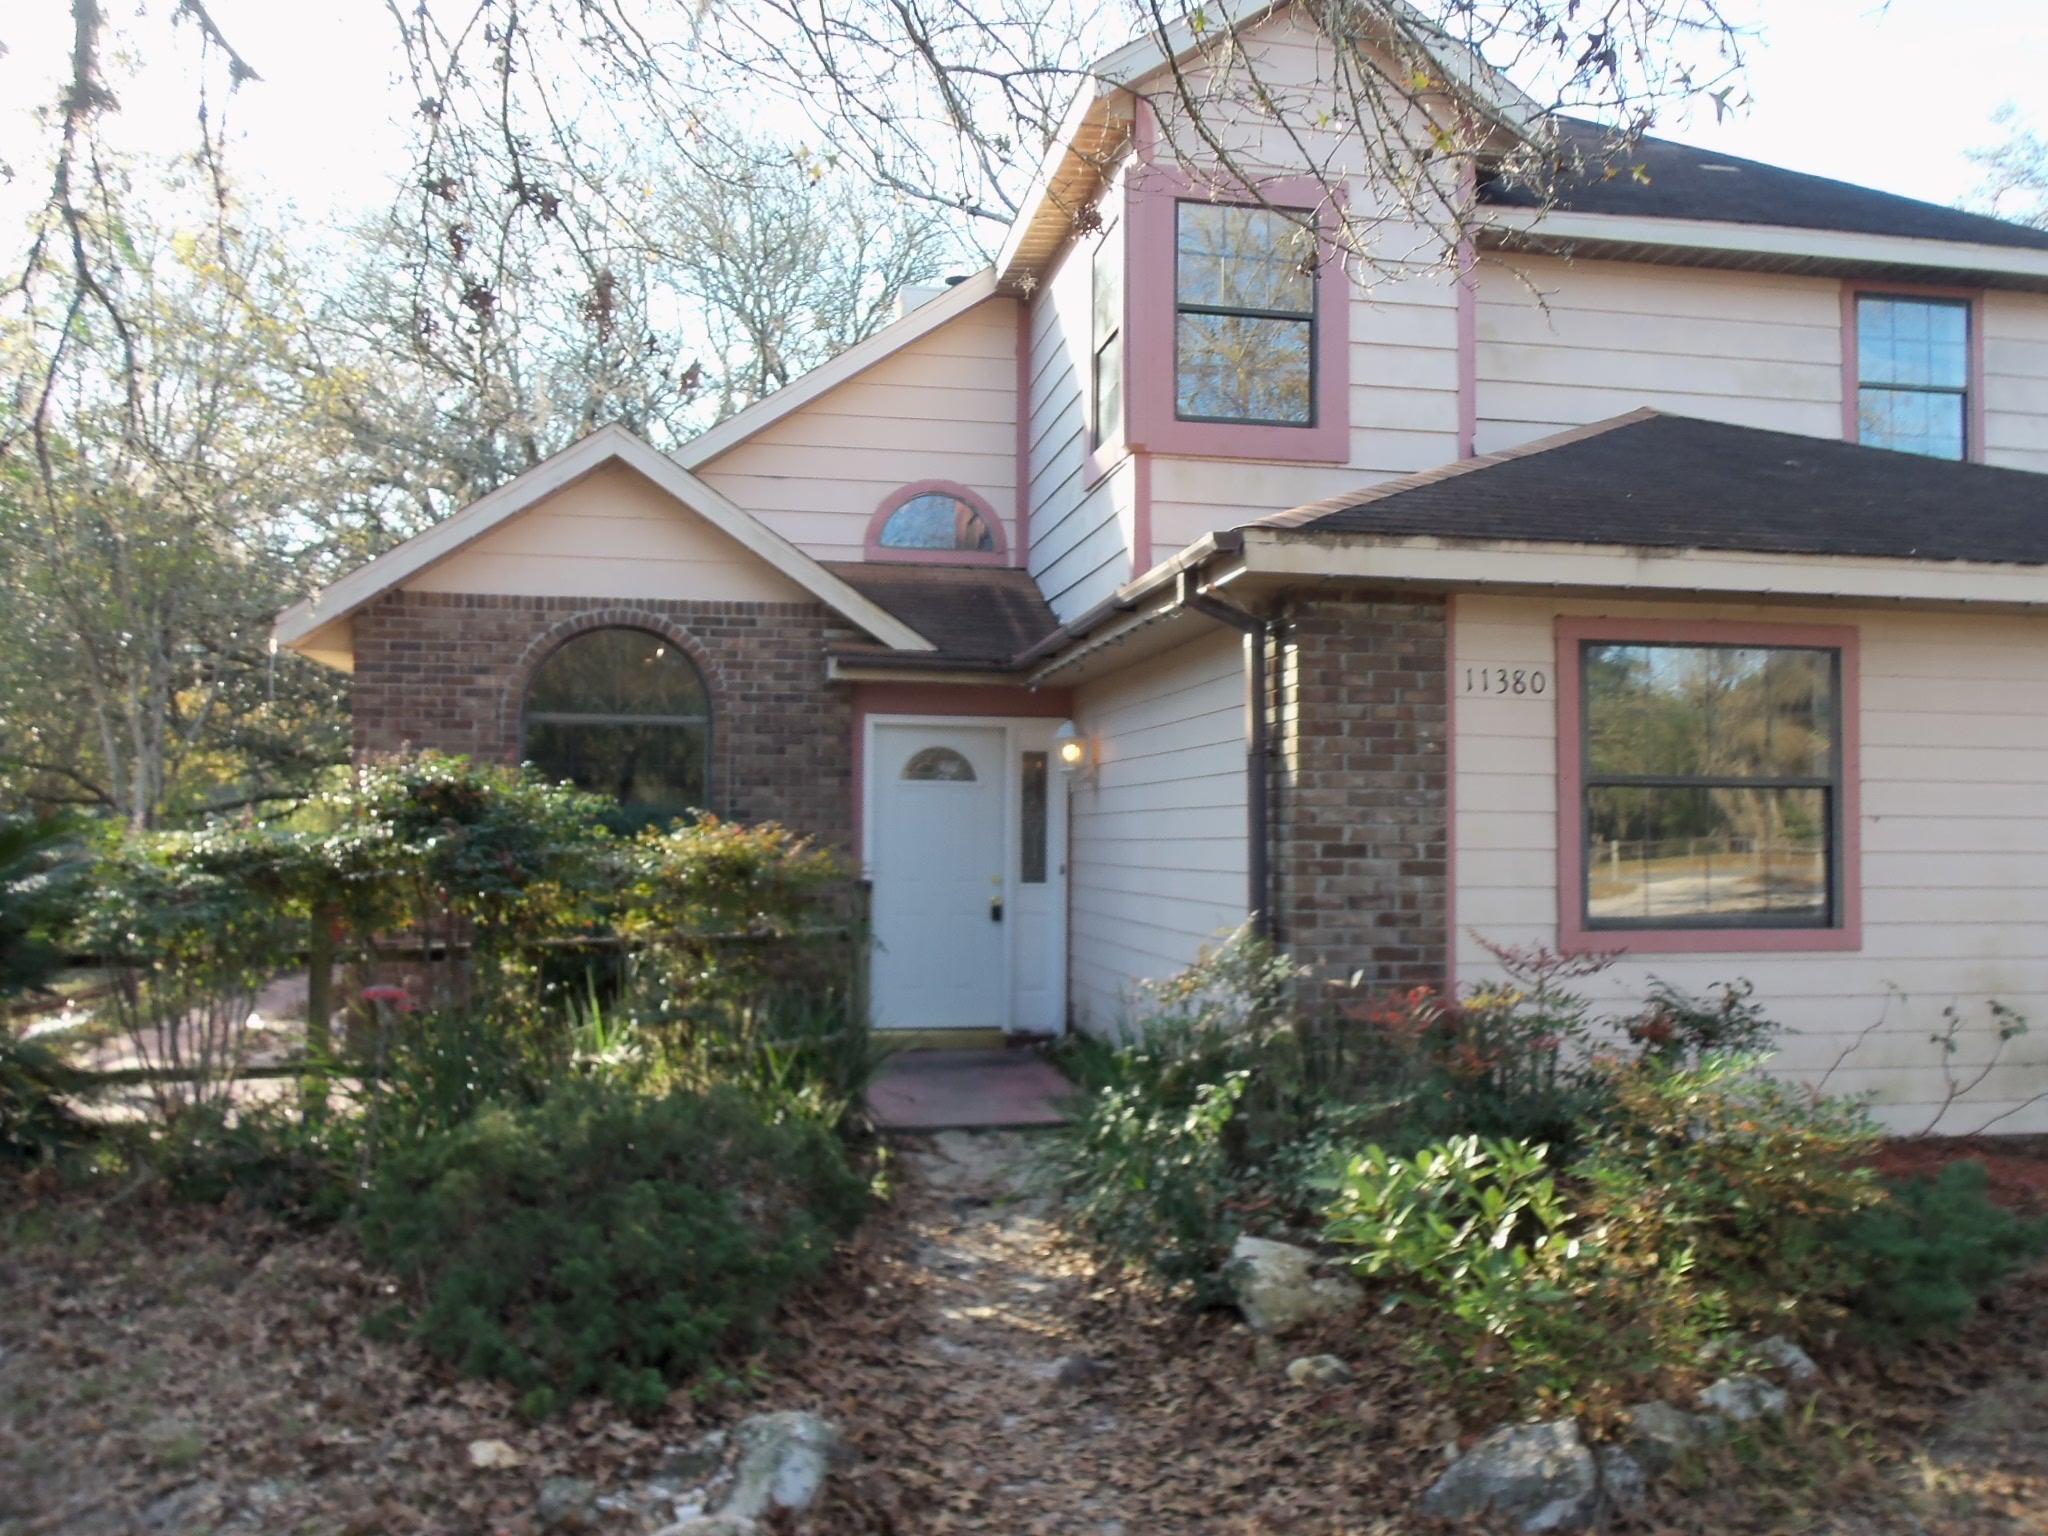 11380 SW 105 AVENUE, Dunnellon, Florida 34431